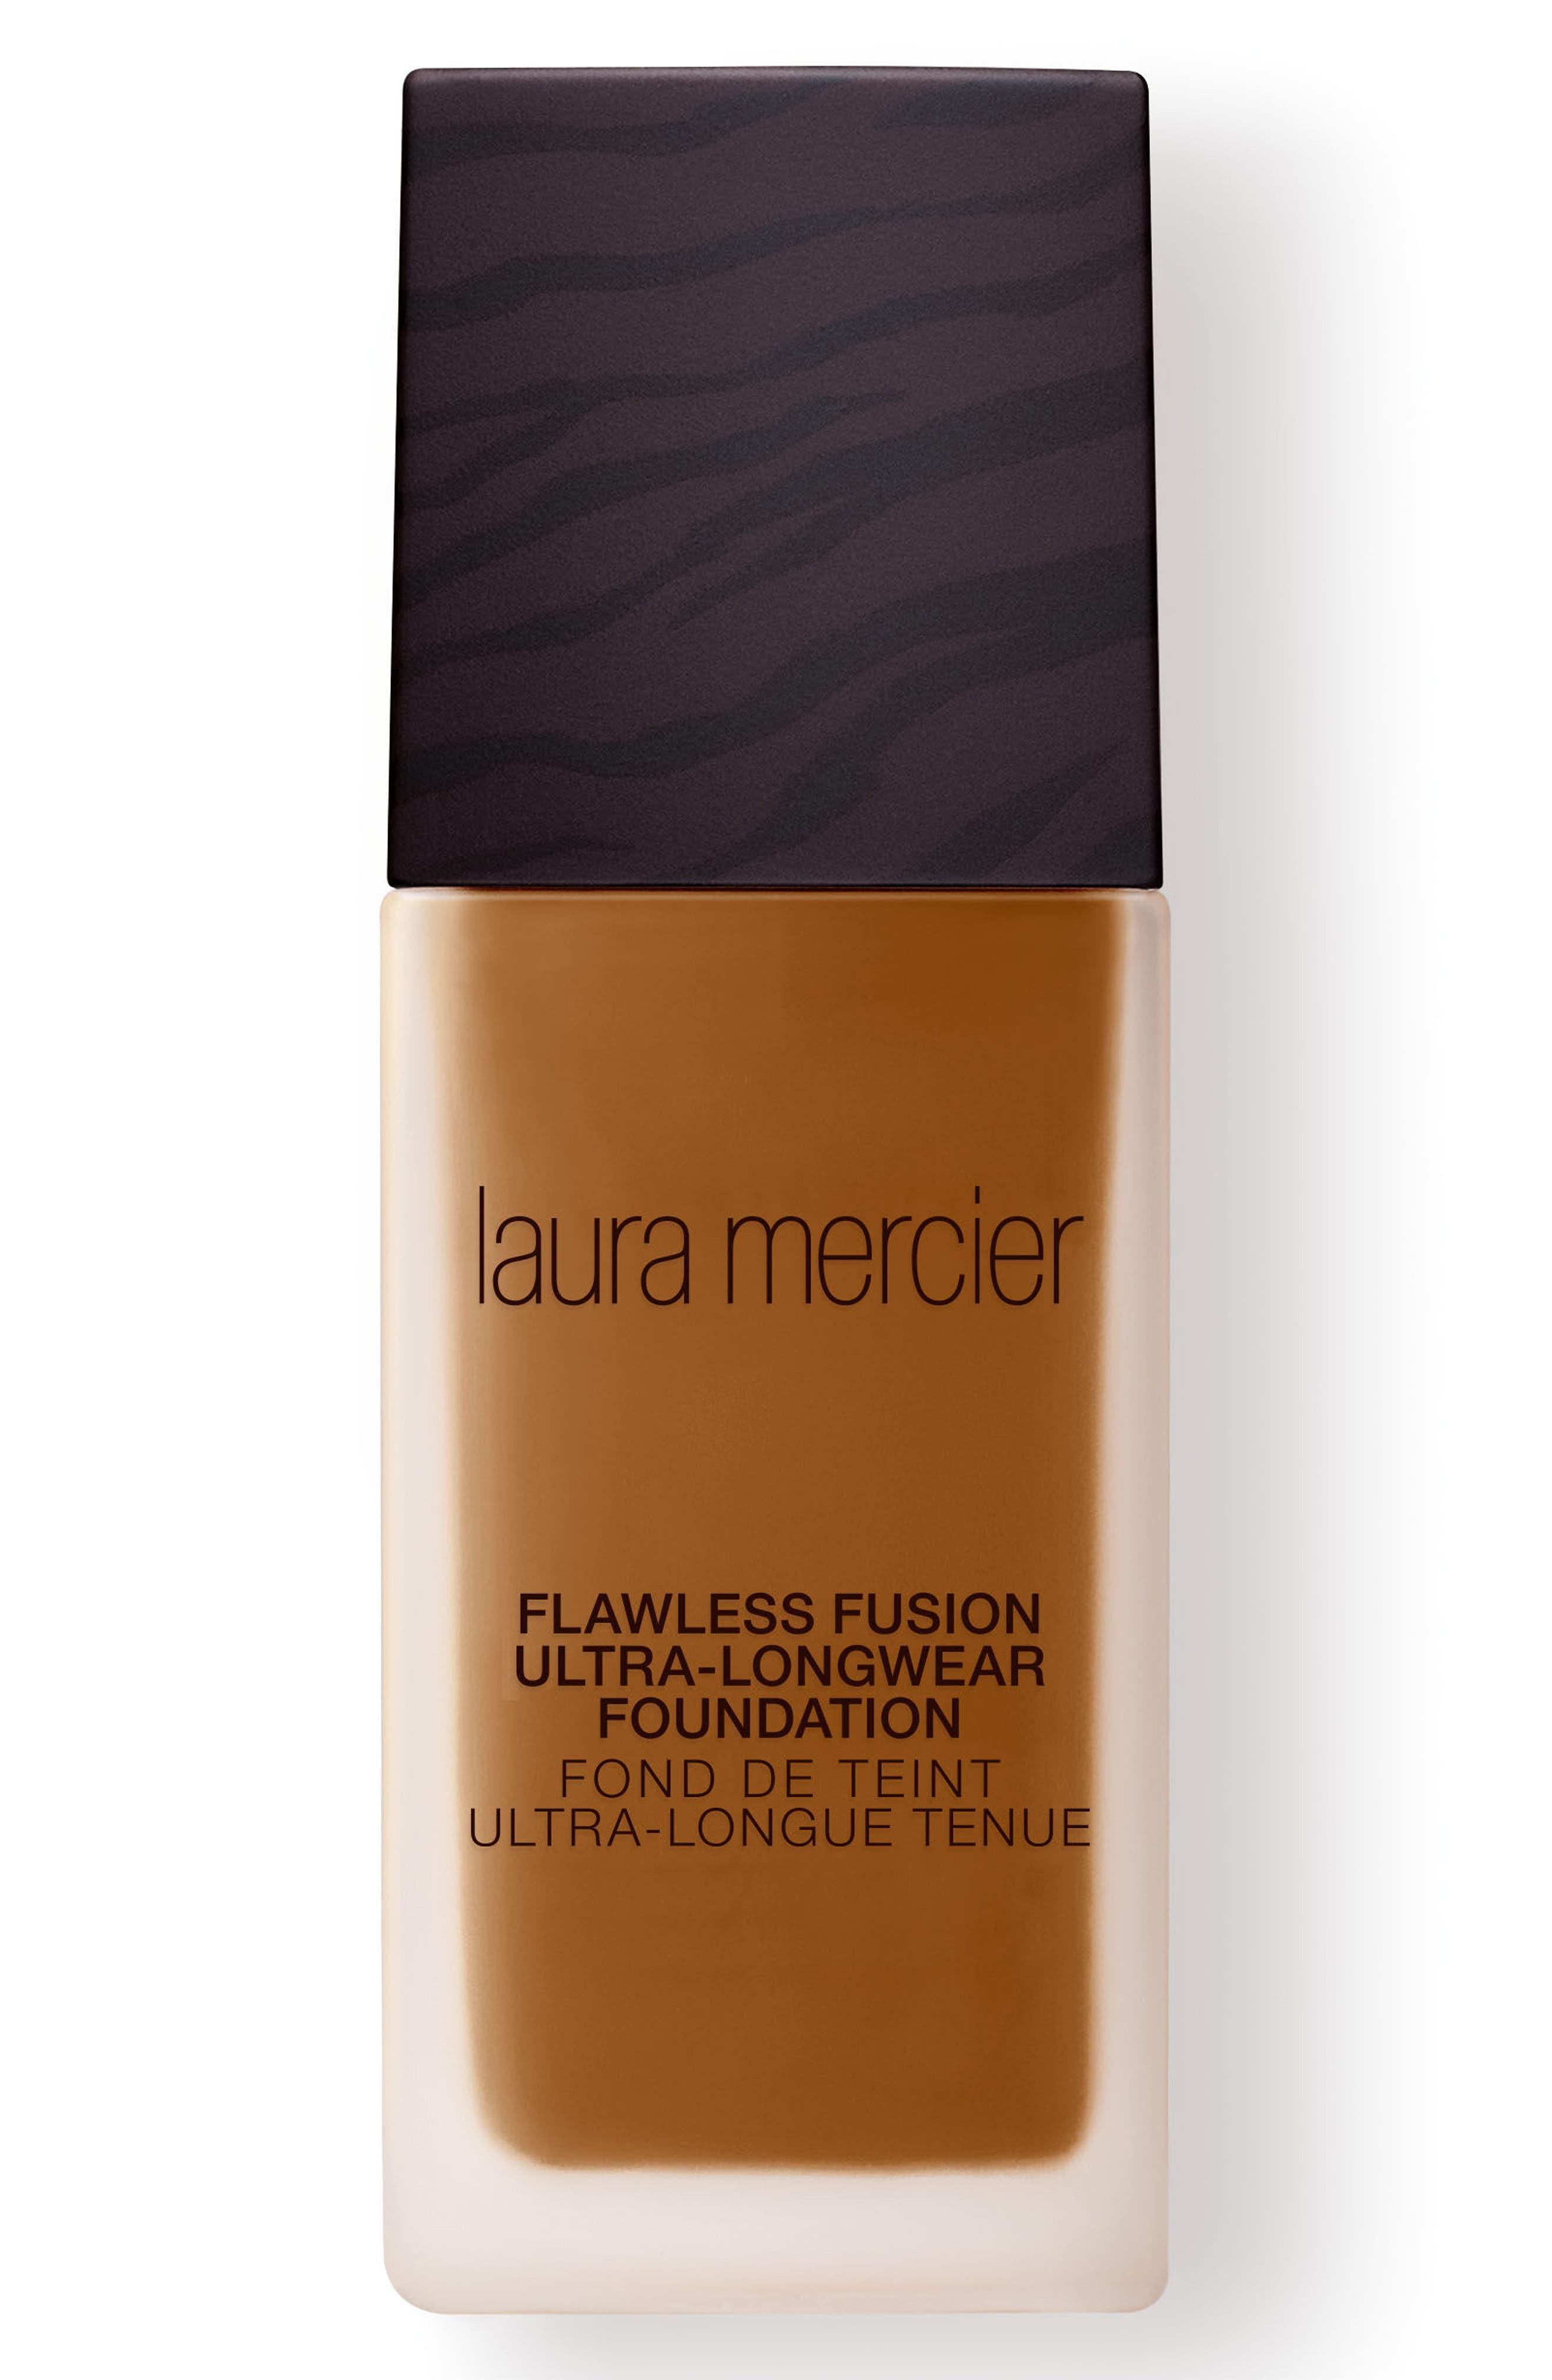 Flawless Fusion Ultra-Longwear Foundation,                             Main thumbnail 1, color,                             5C1 NUTMEG